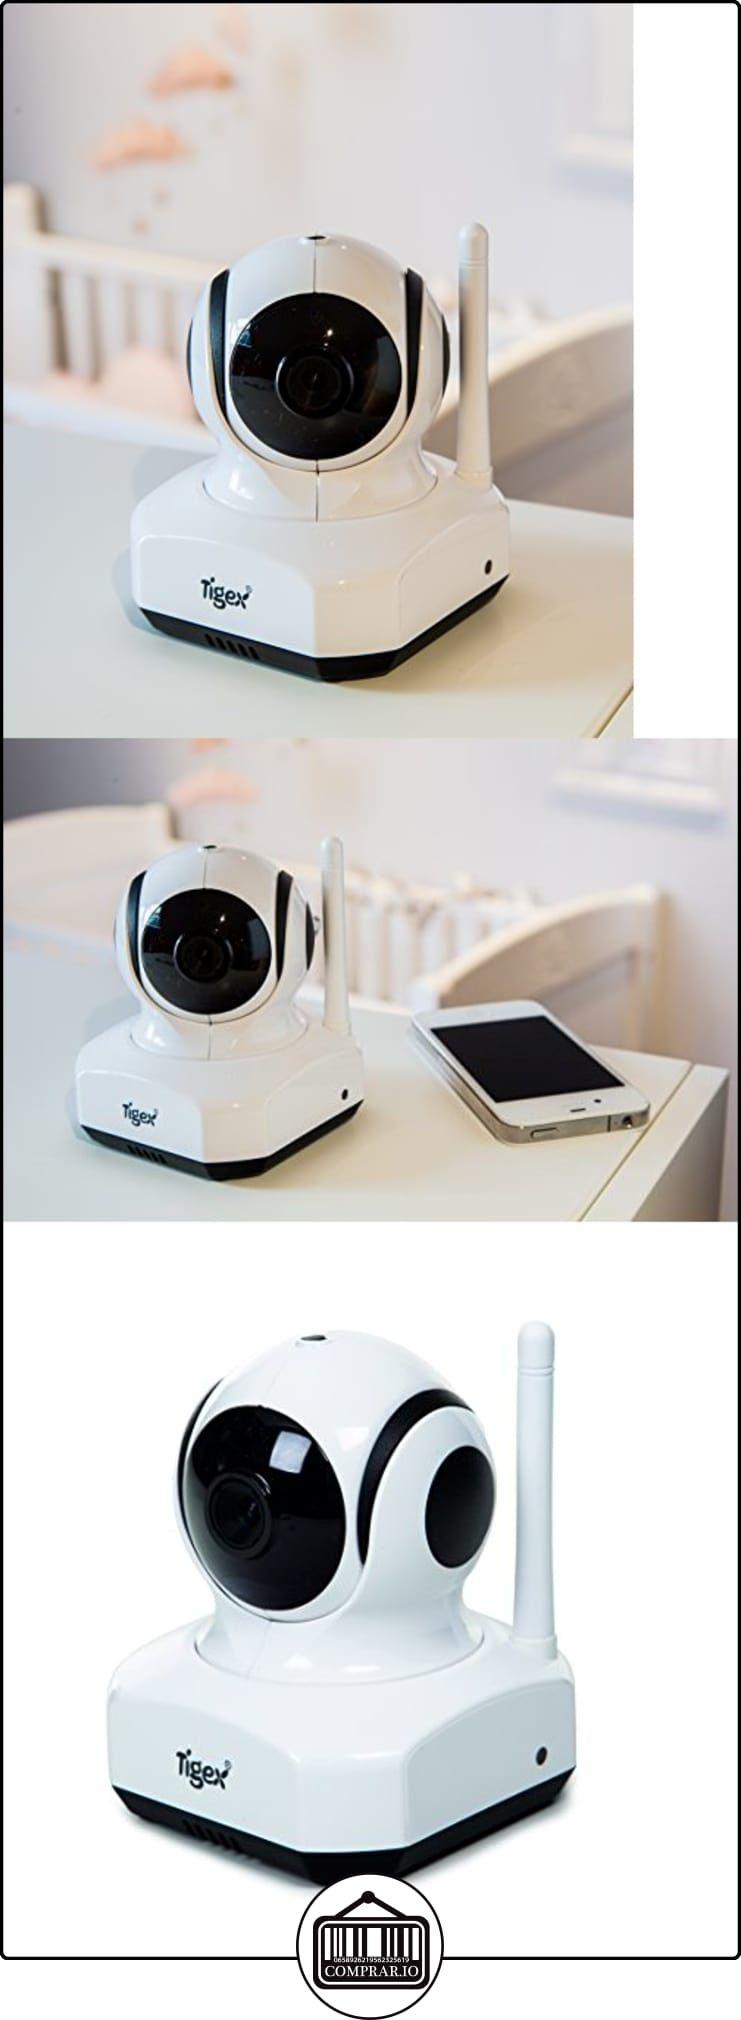 Tigex - Vigilabebés (vídeo, incluye apps), color blanco  ✿ Vigilabebés - Seguridad ✿ ▬► Ver oferta: http://comprar.io/goto/B00T9L0D1C